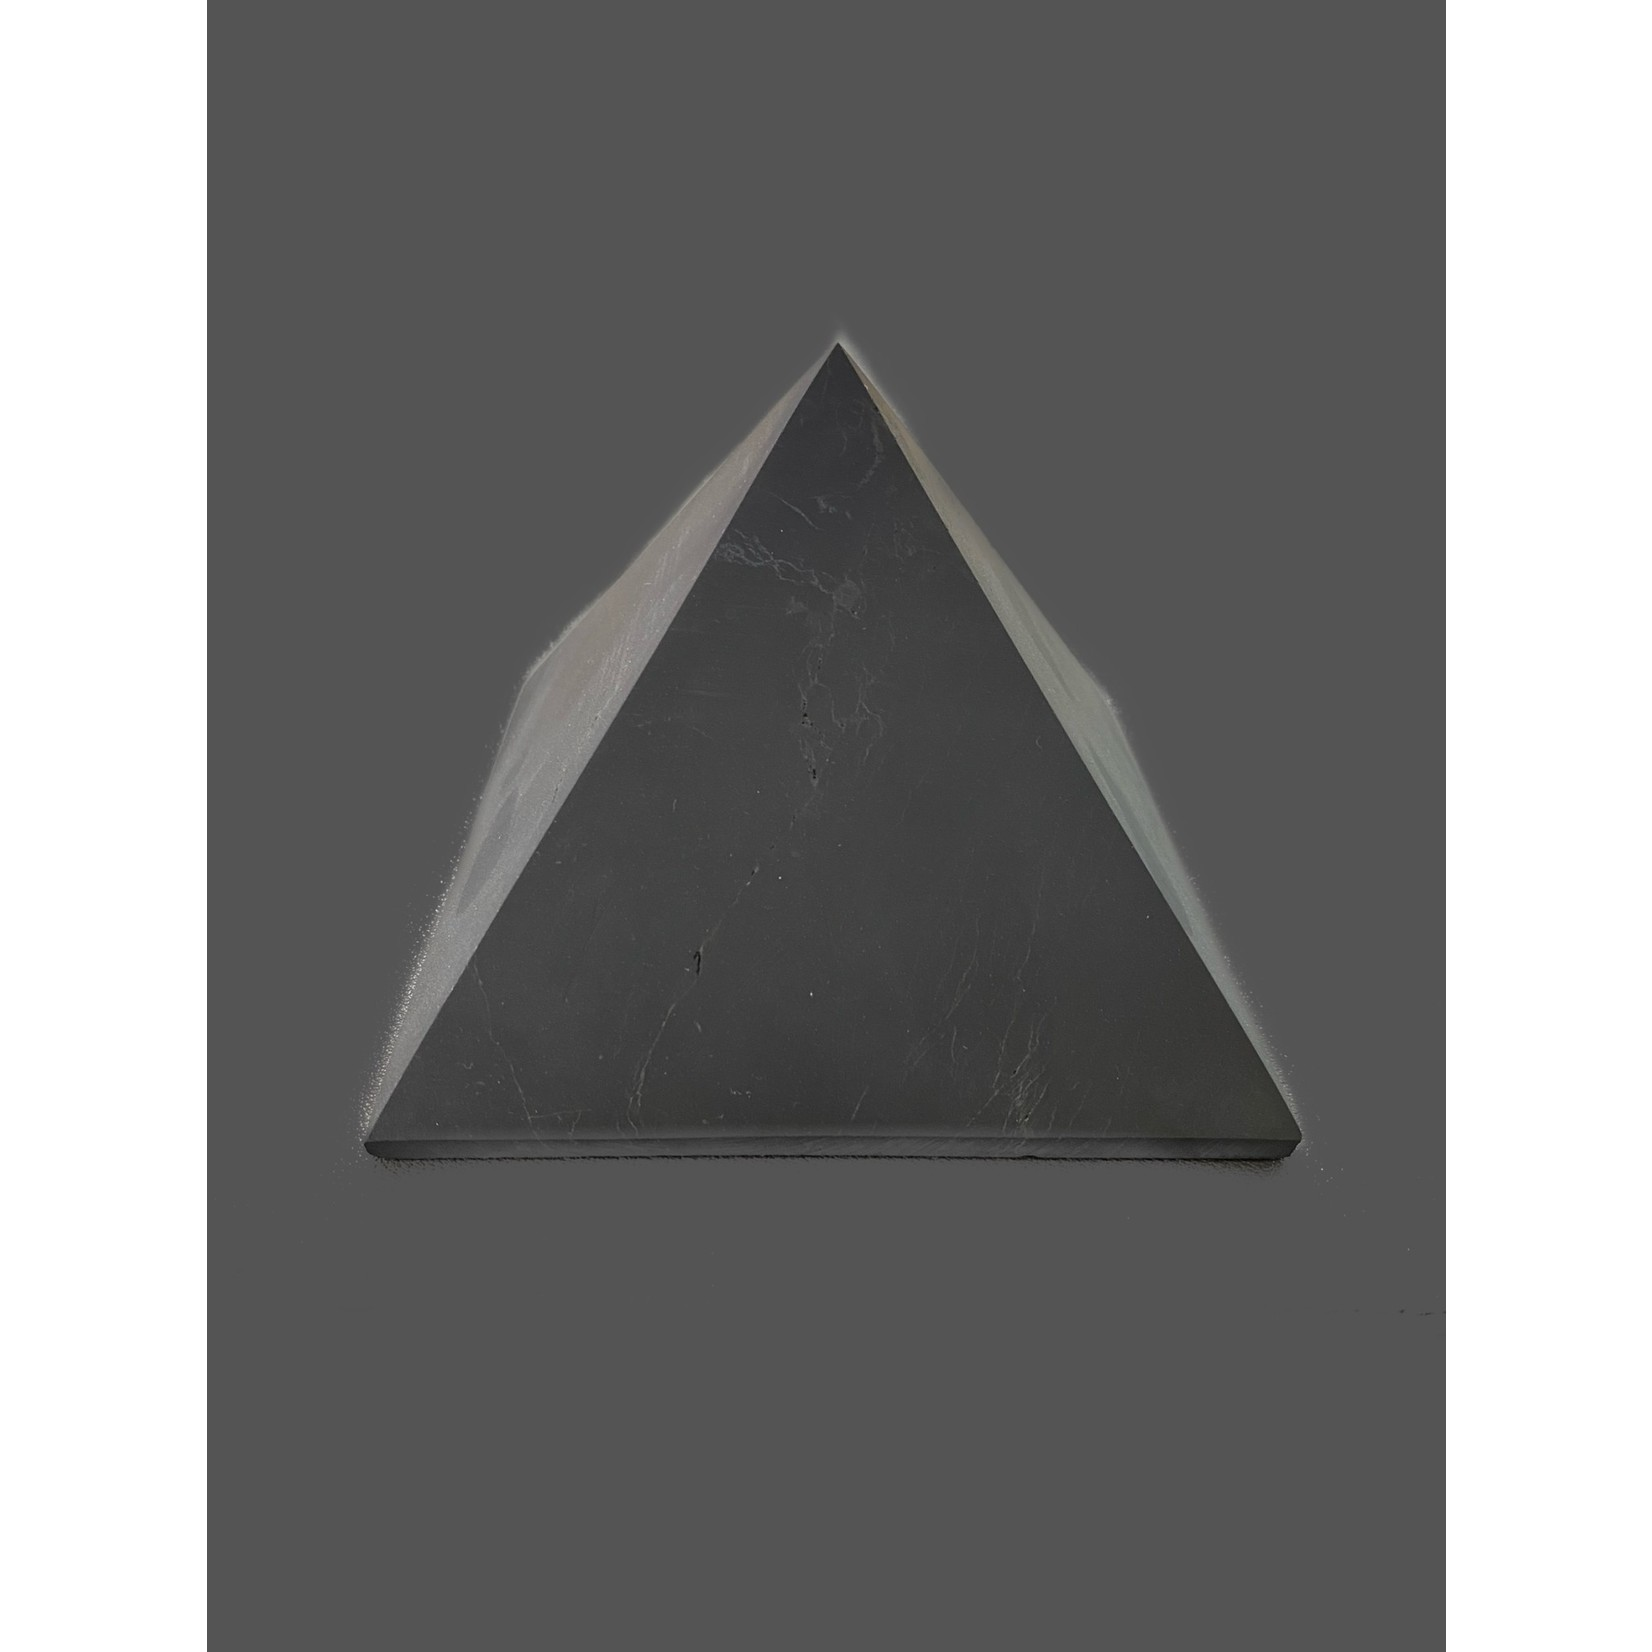 Pirámide Shungit Pulida Mate 10x10cm